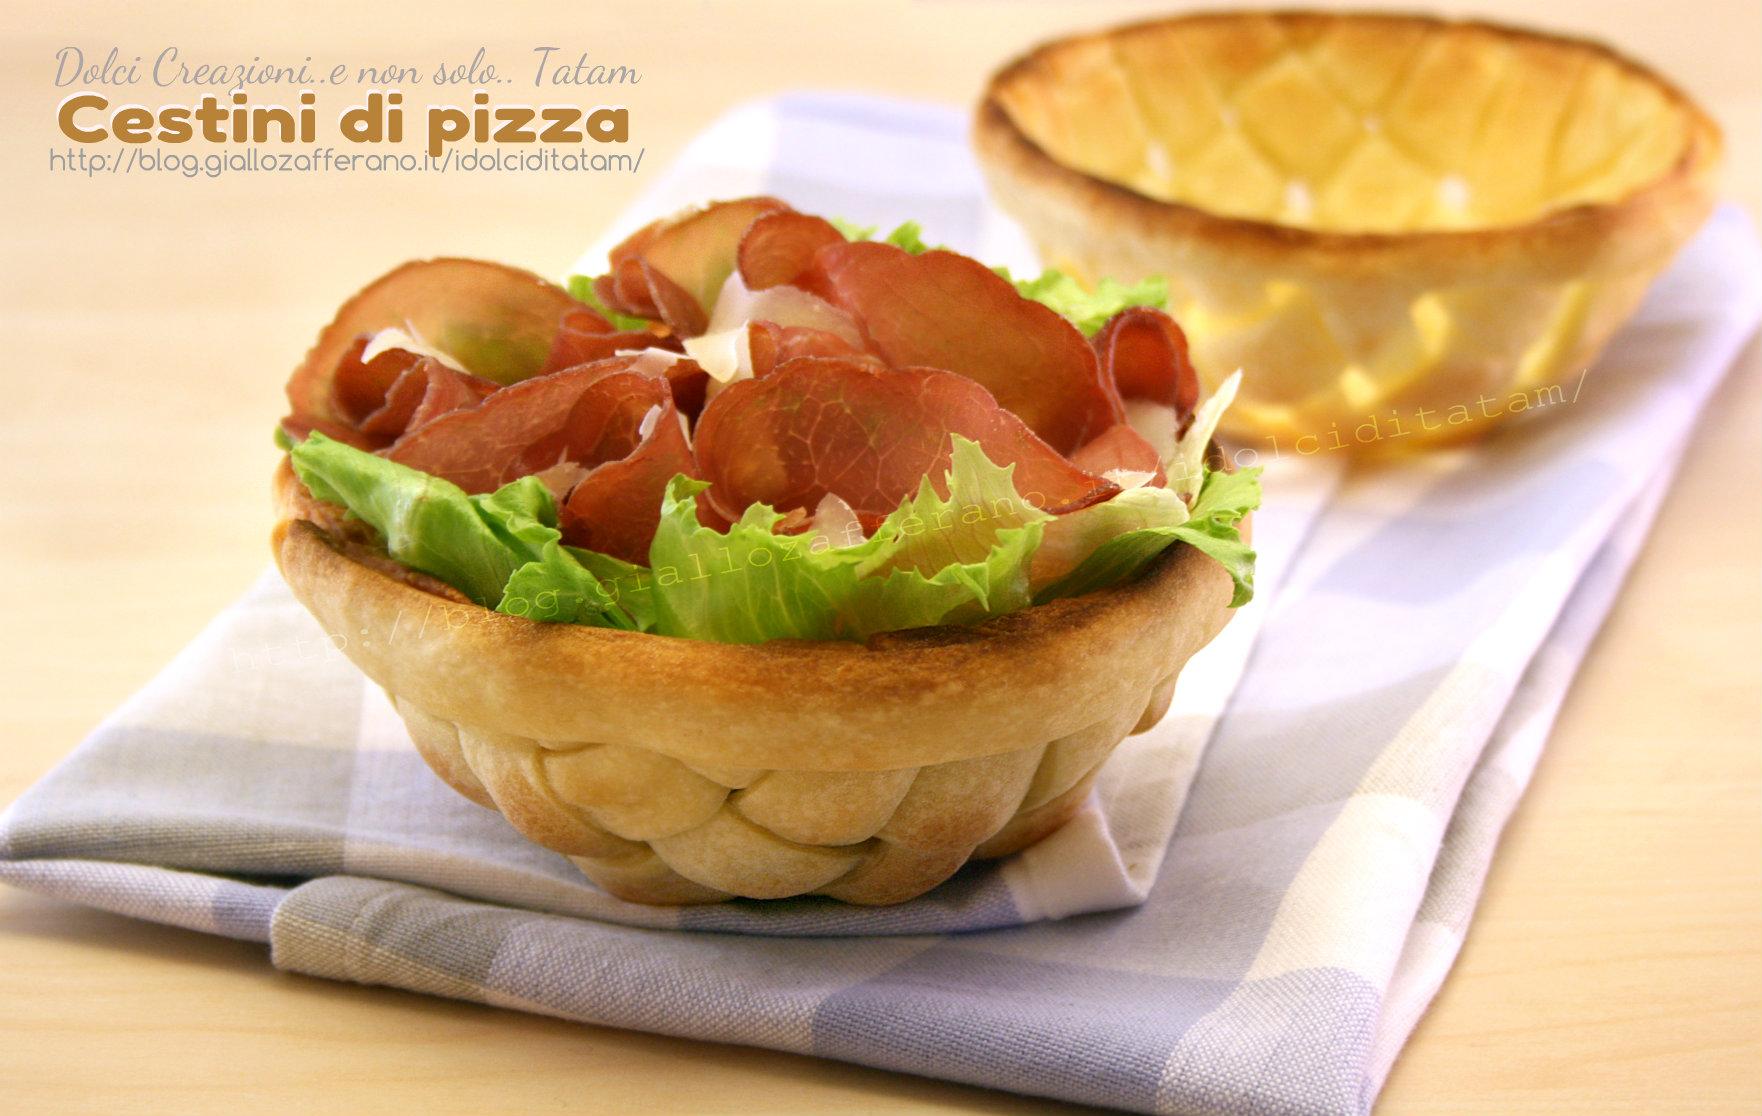 Cestini di pizza